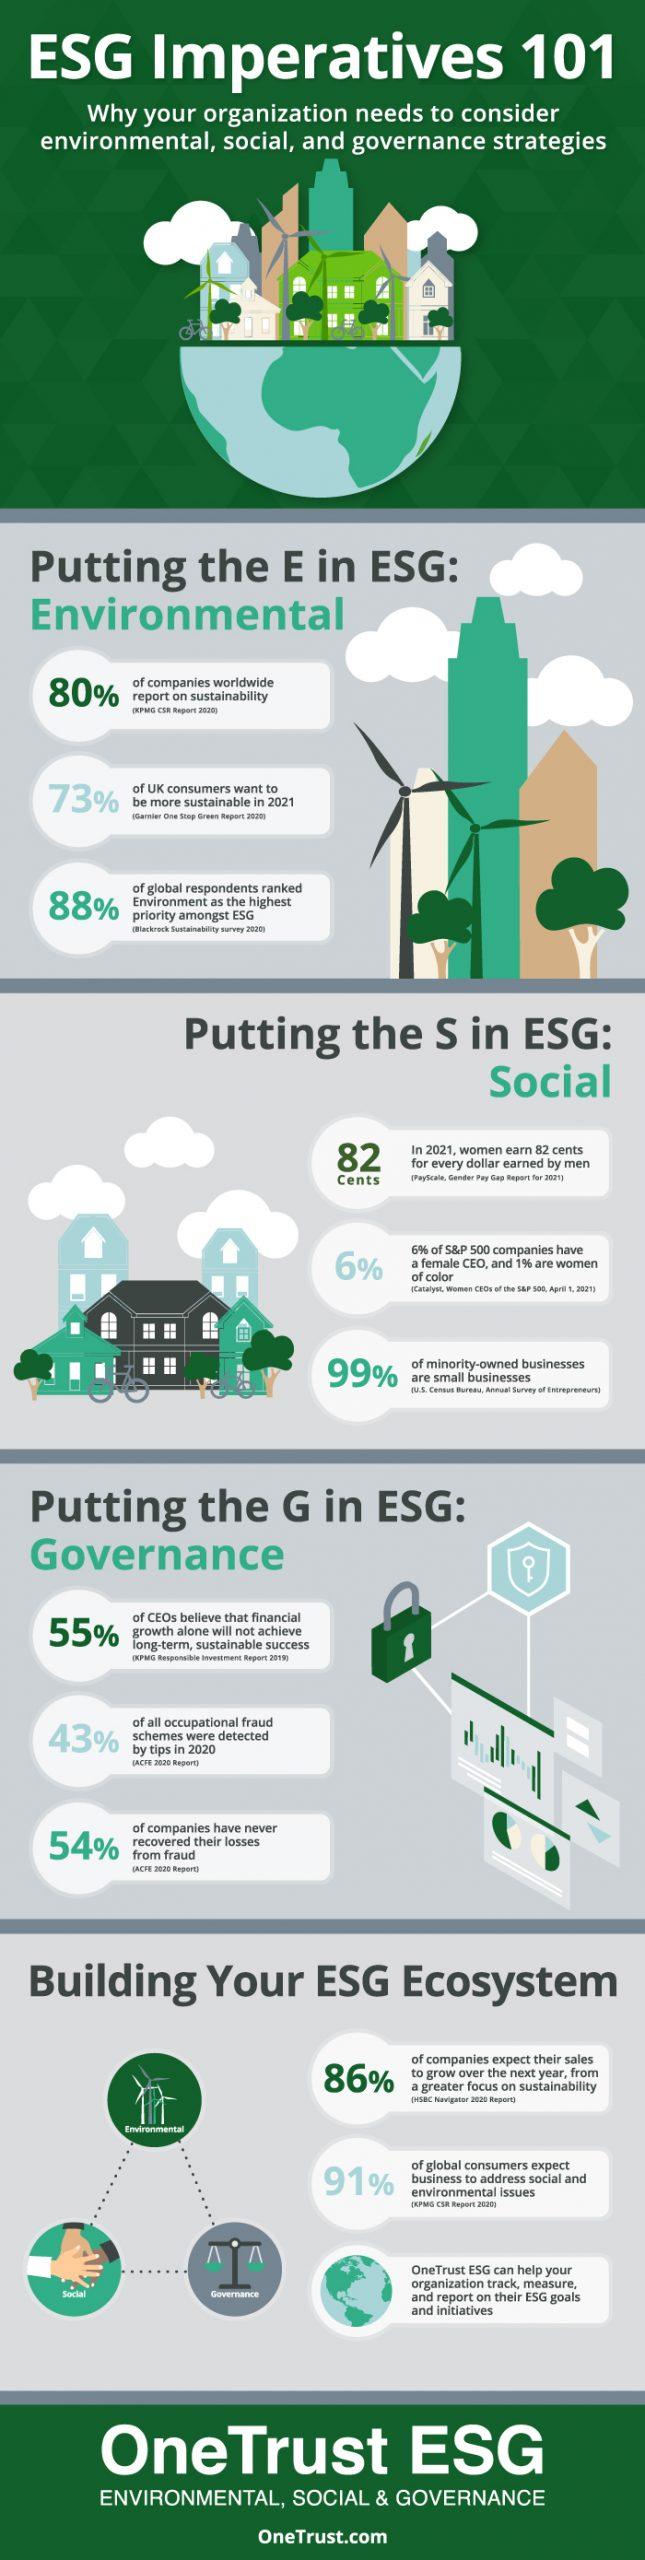 ESG 101 Infographic